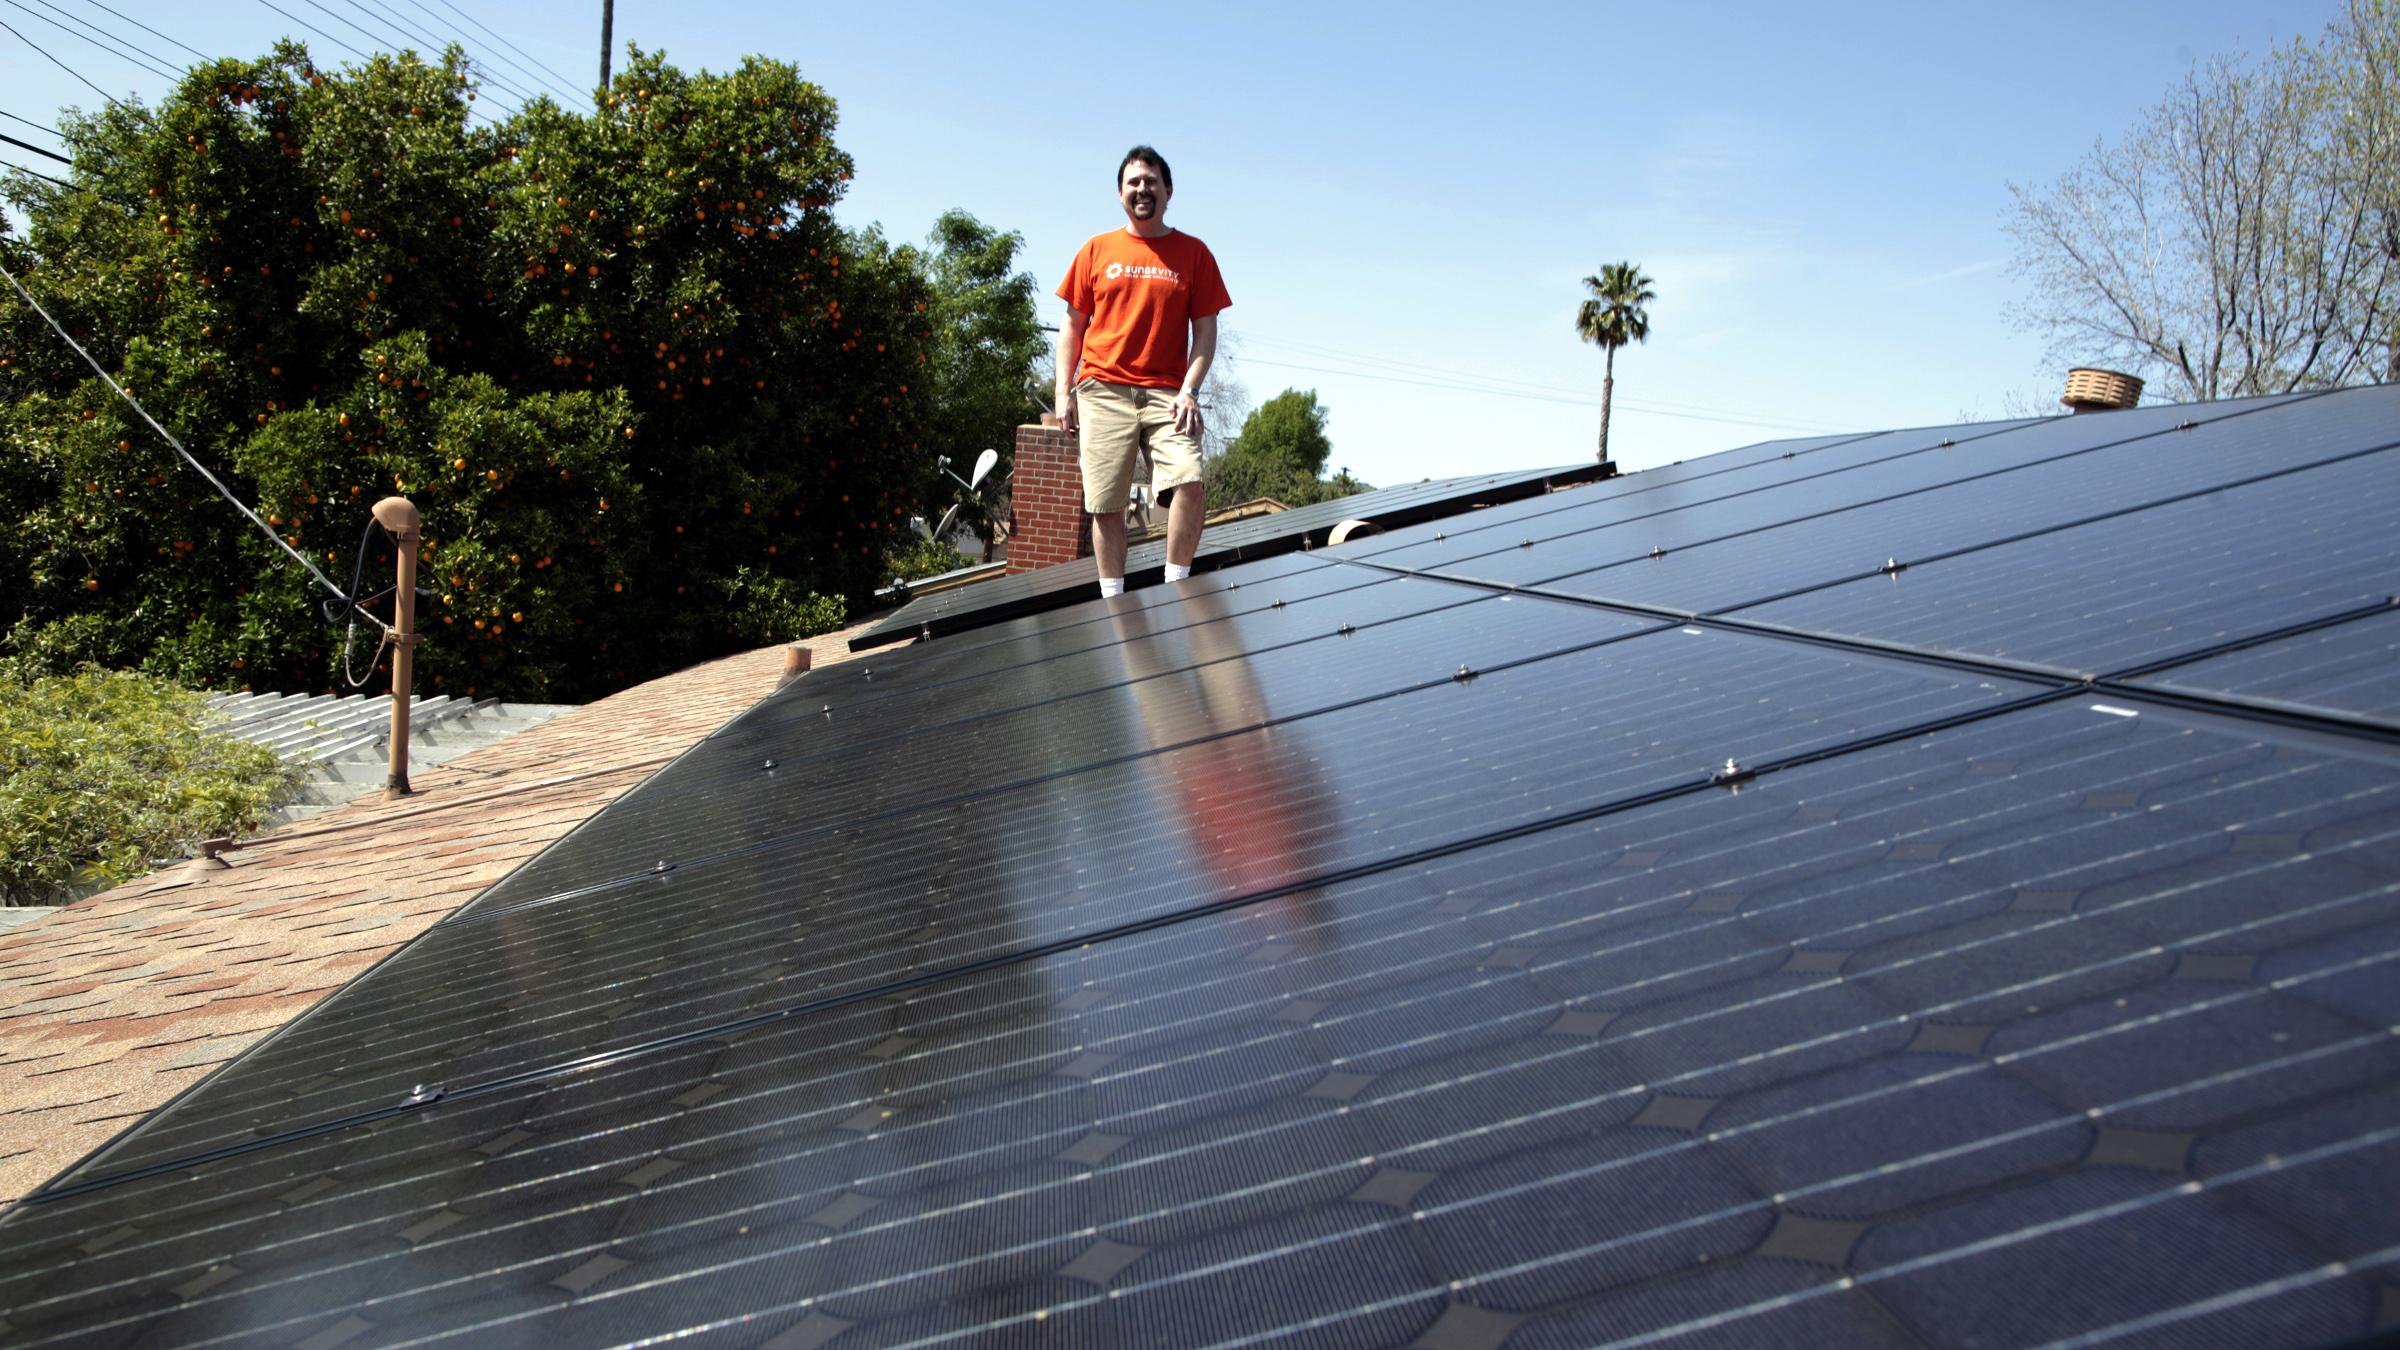 Solarcity Solar Panels >> The Real Reason Elon Musk Is Bringing Tesla Tsla And Solar City